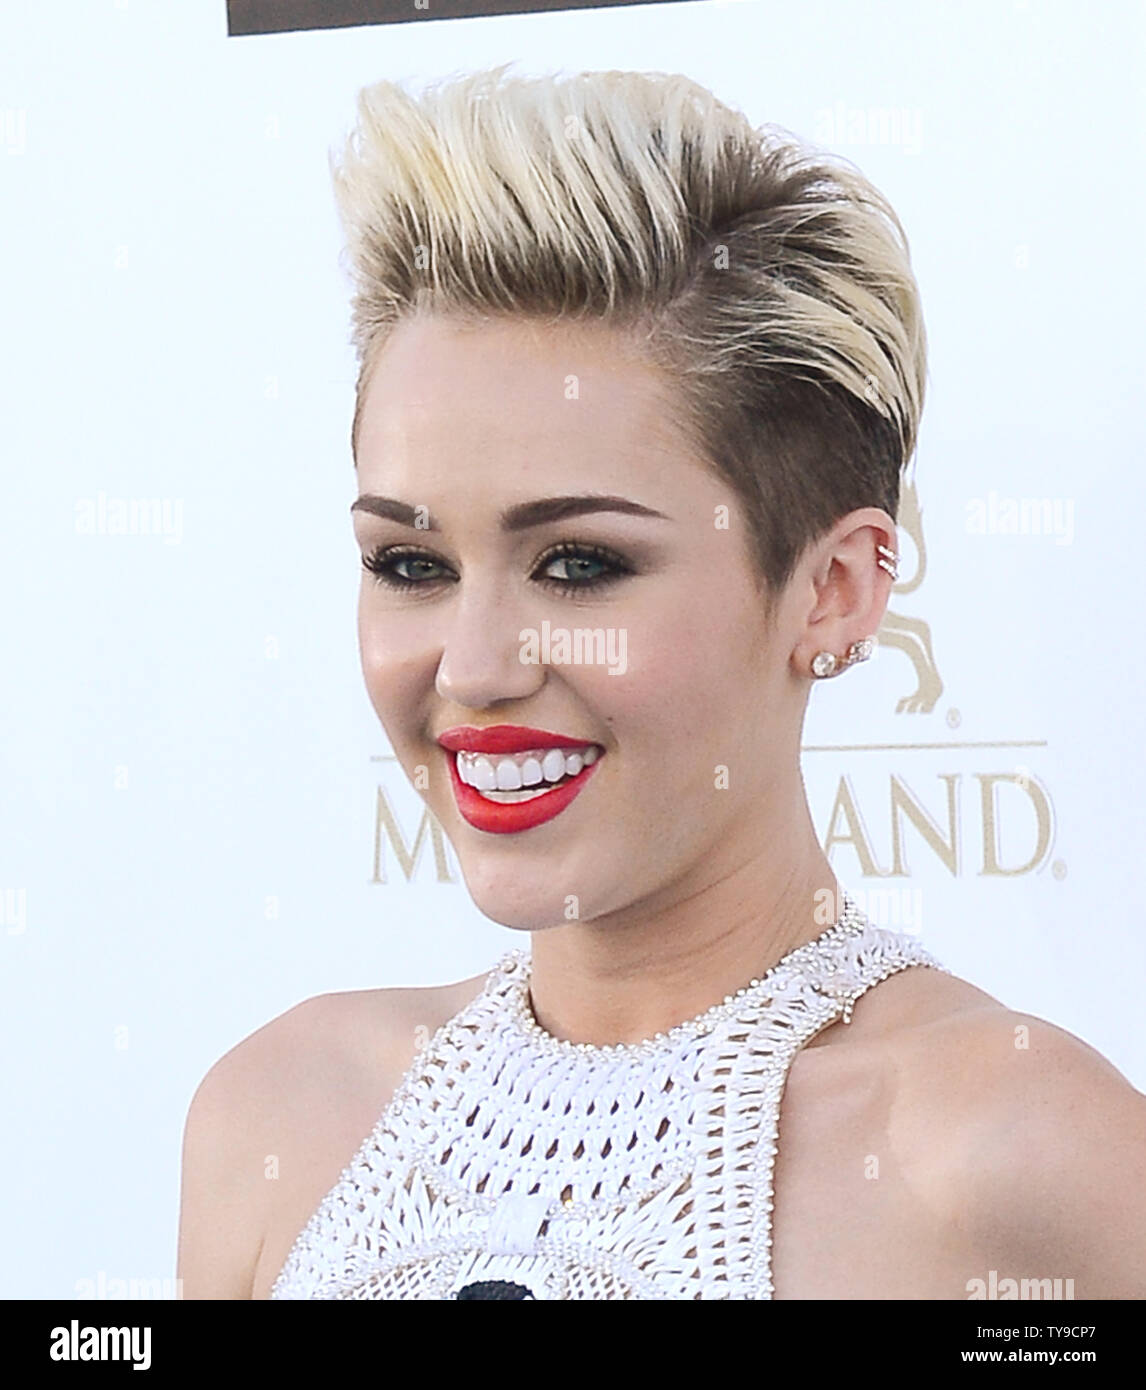 Miley may miley cyrus